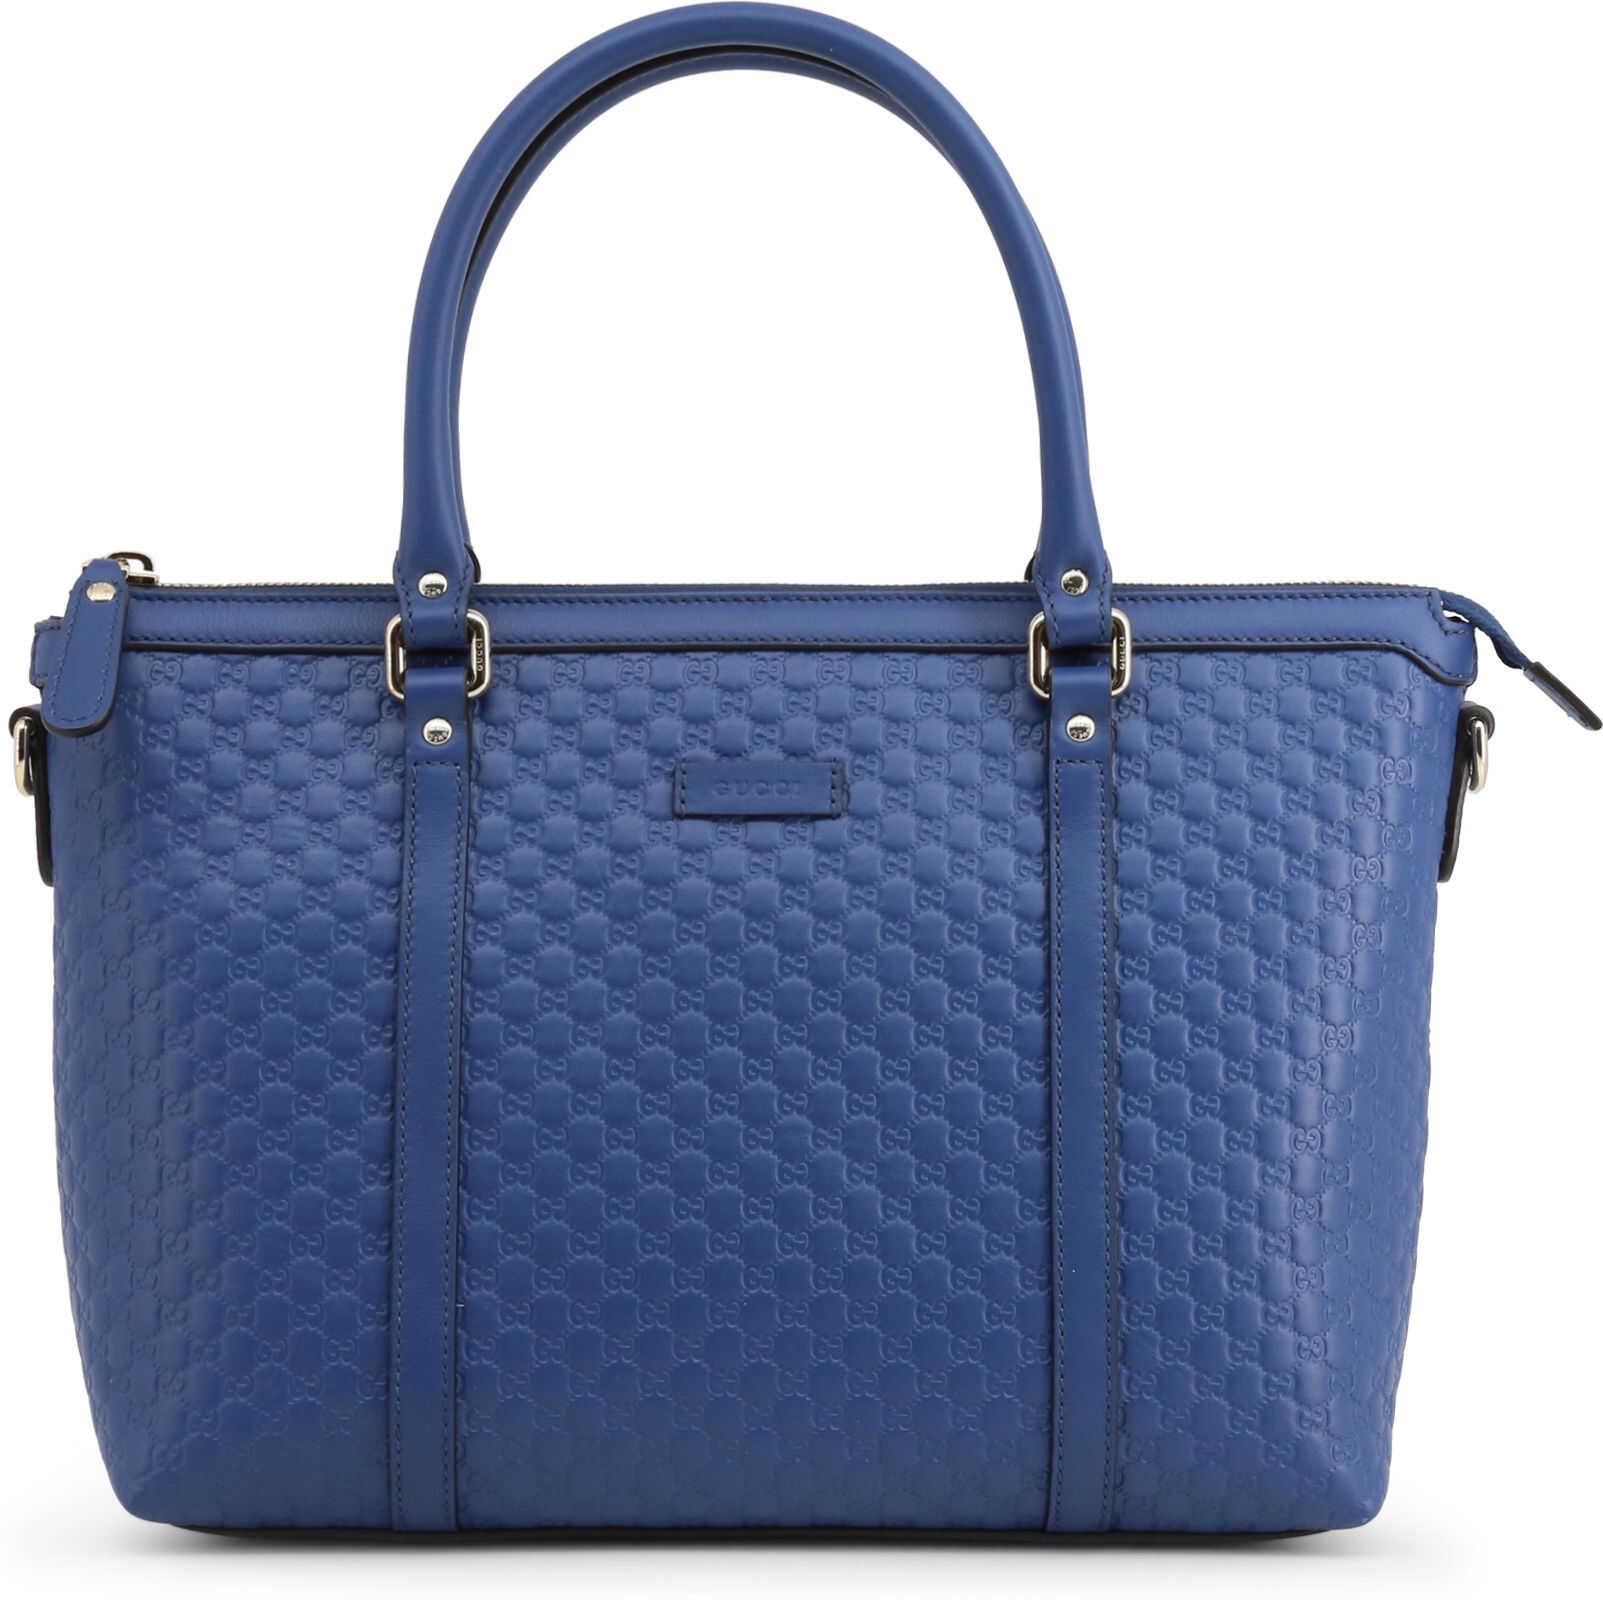 Gucci 449656_Bmj1G BLUE imagine b-mall.ro